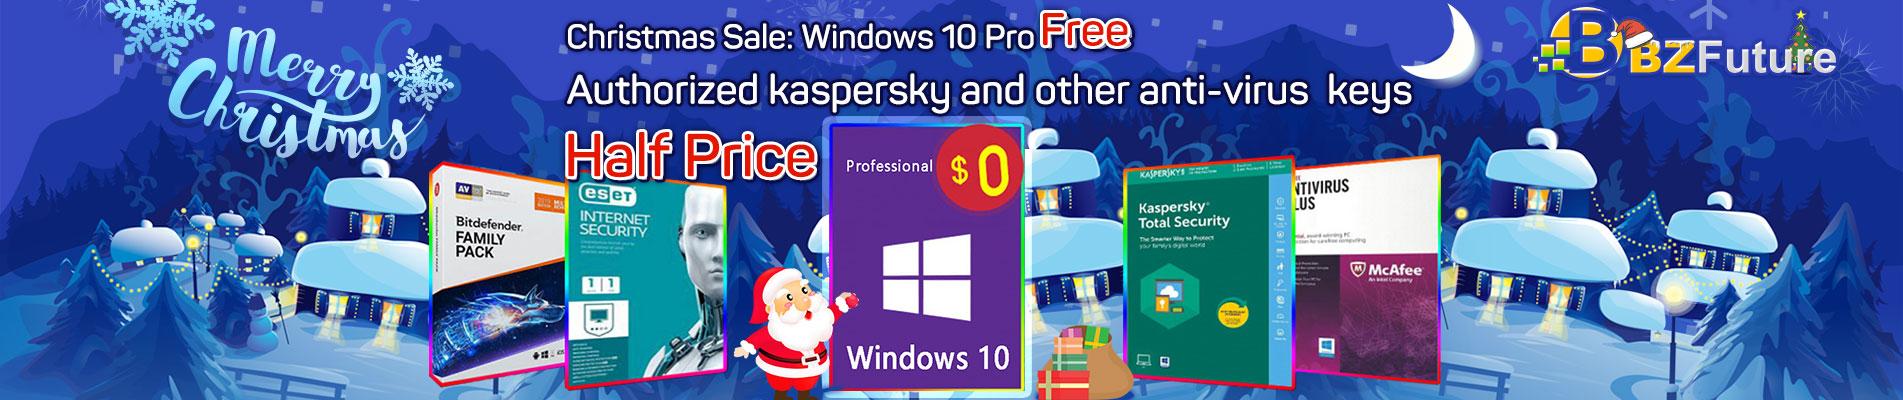 BZFUTURE Sale windows 10 pro oem free